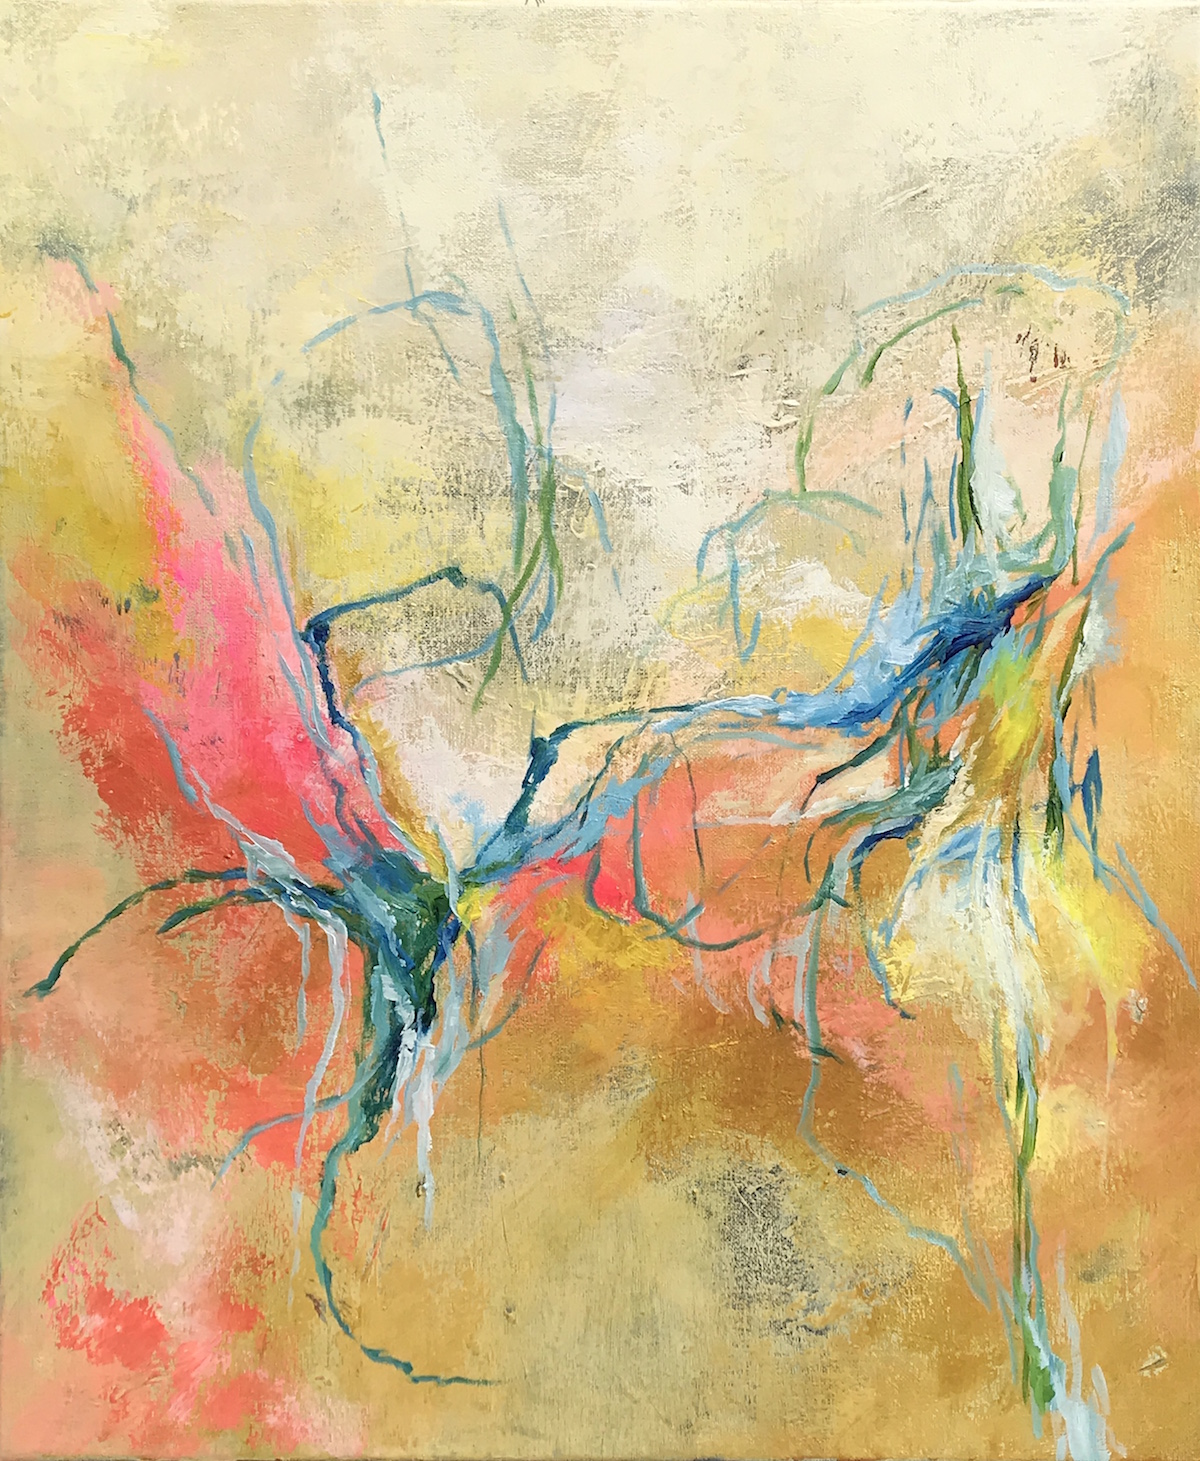 Untitled - acrylic on canvas 50x60 cm £350